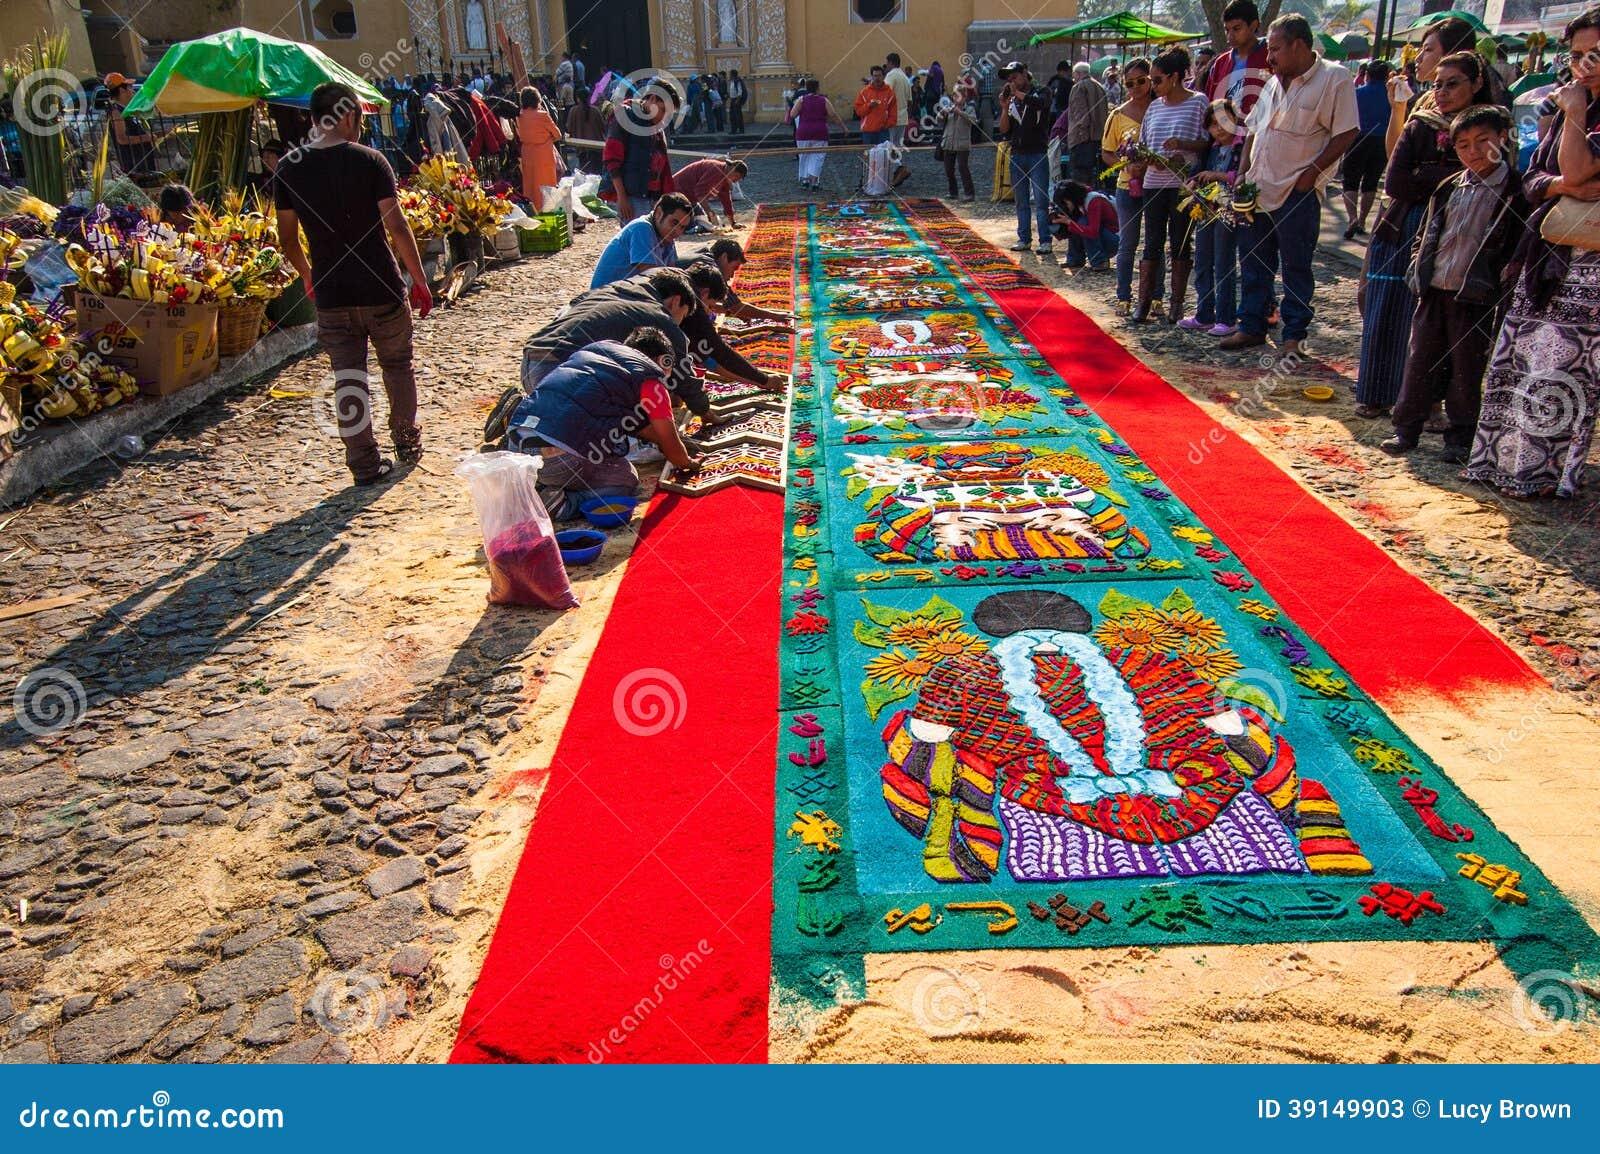 Fabricaci n de una alfombra de la semana santa antigua for Imagenes de alfombras